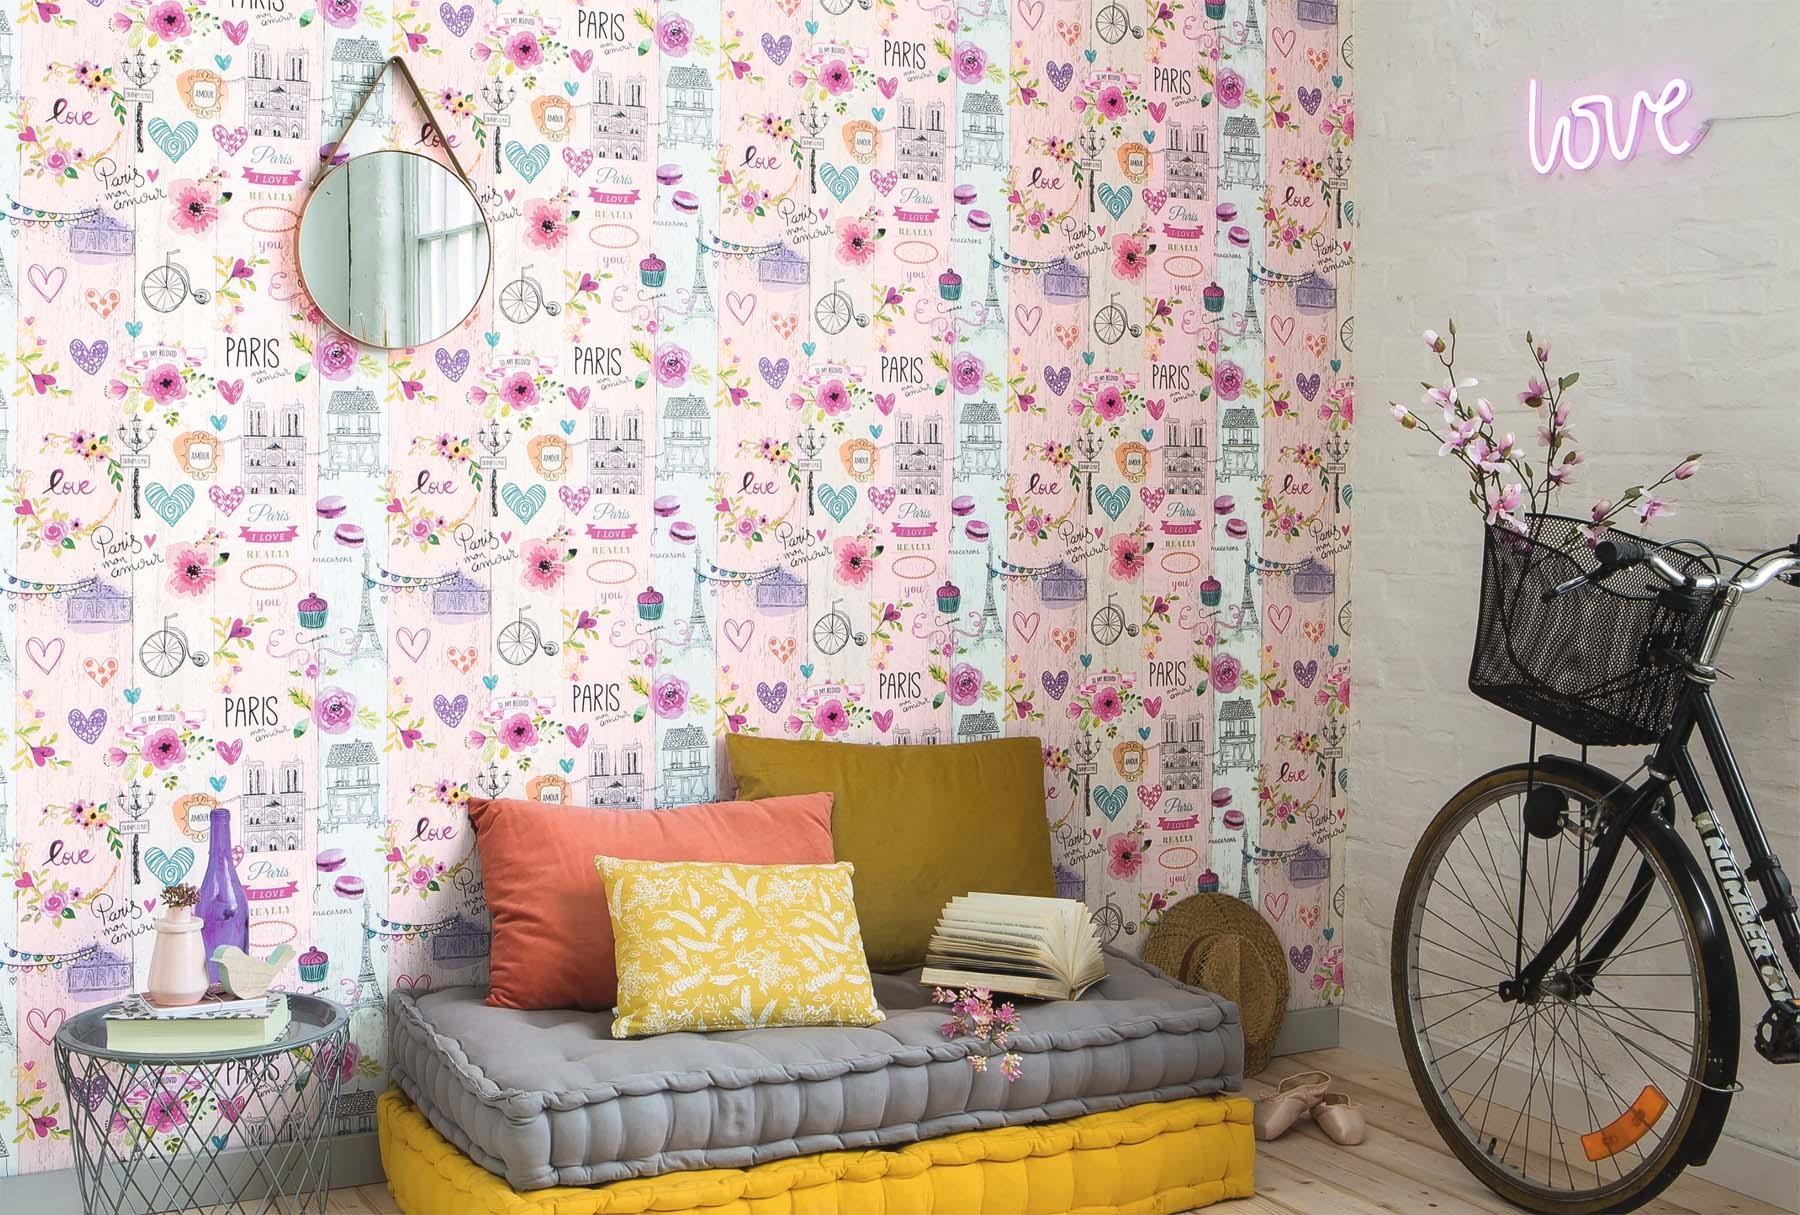 les aventures kollektion essener tapeten gratisversand. Black Bedroom Furniture Sets. Home Design Ideas